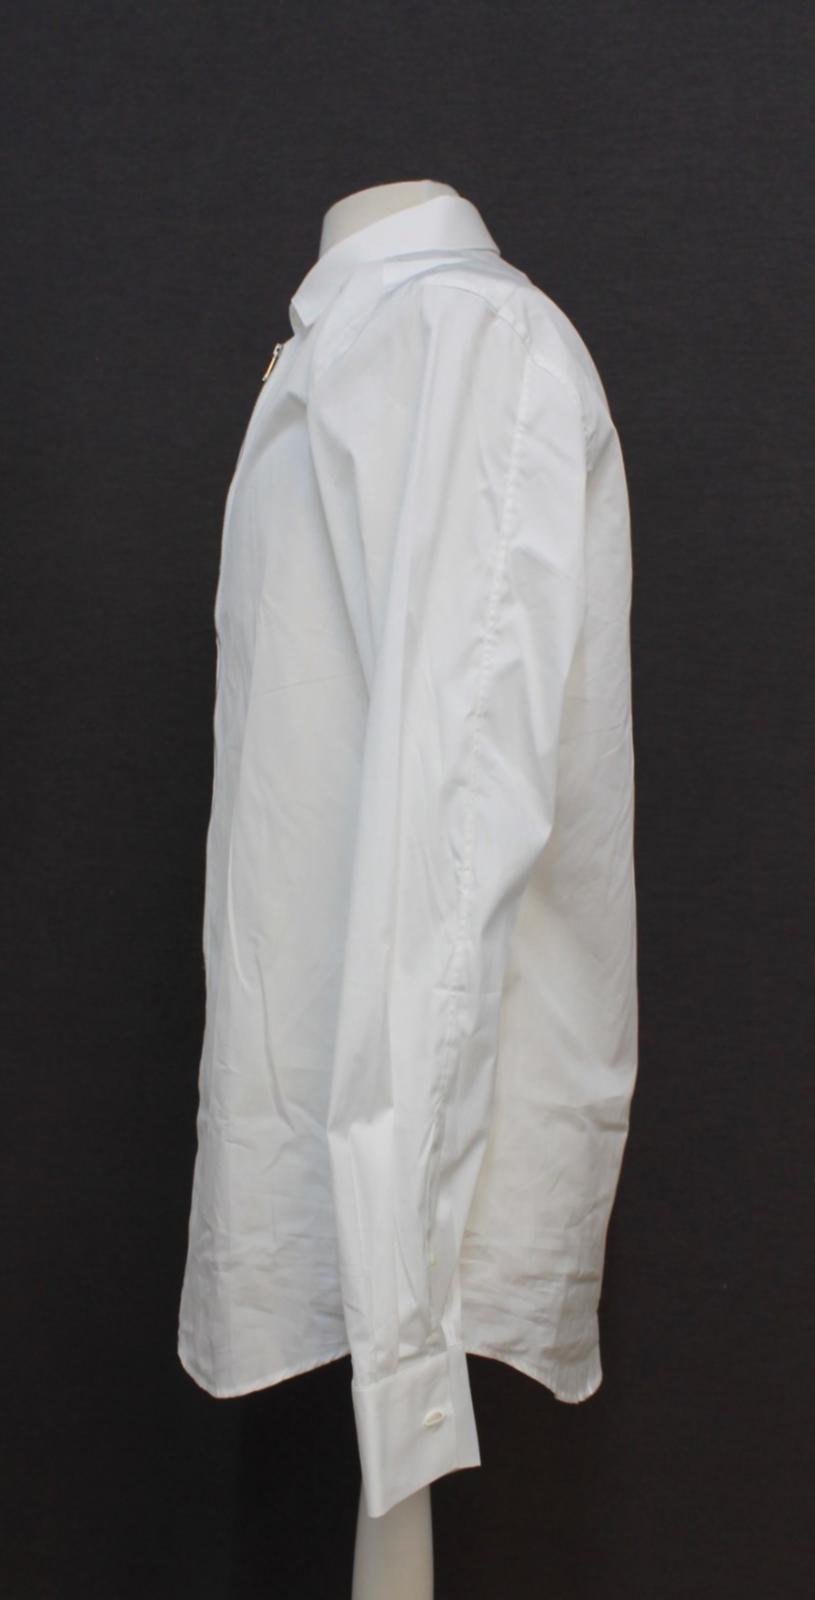 Neil-Barrett-para-hombre-calce-cenido-de-algodon-blanco-frontal-con-cremallera-con-cuello-camisa miniatura 6